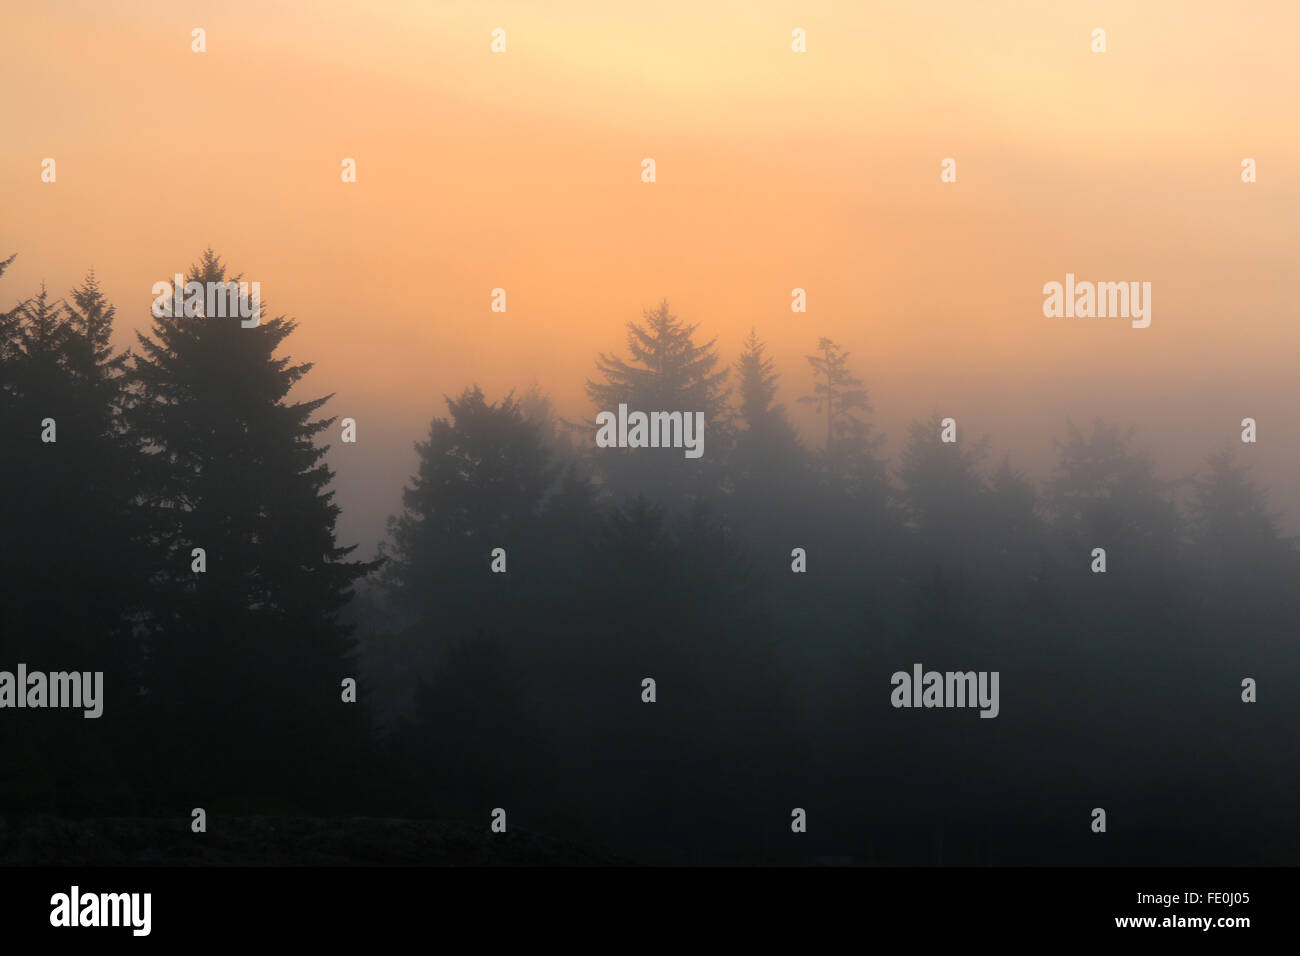 sunrise over trees, Wickannish, Vancouver island - Stock Image